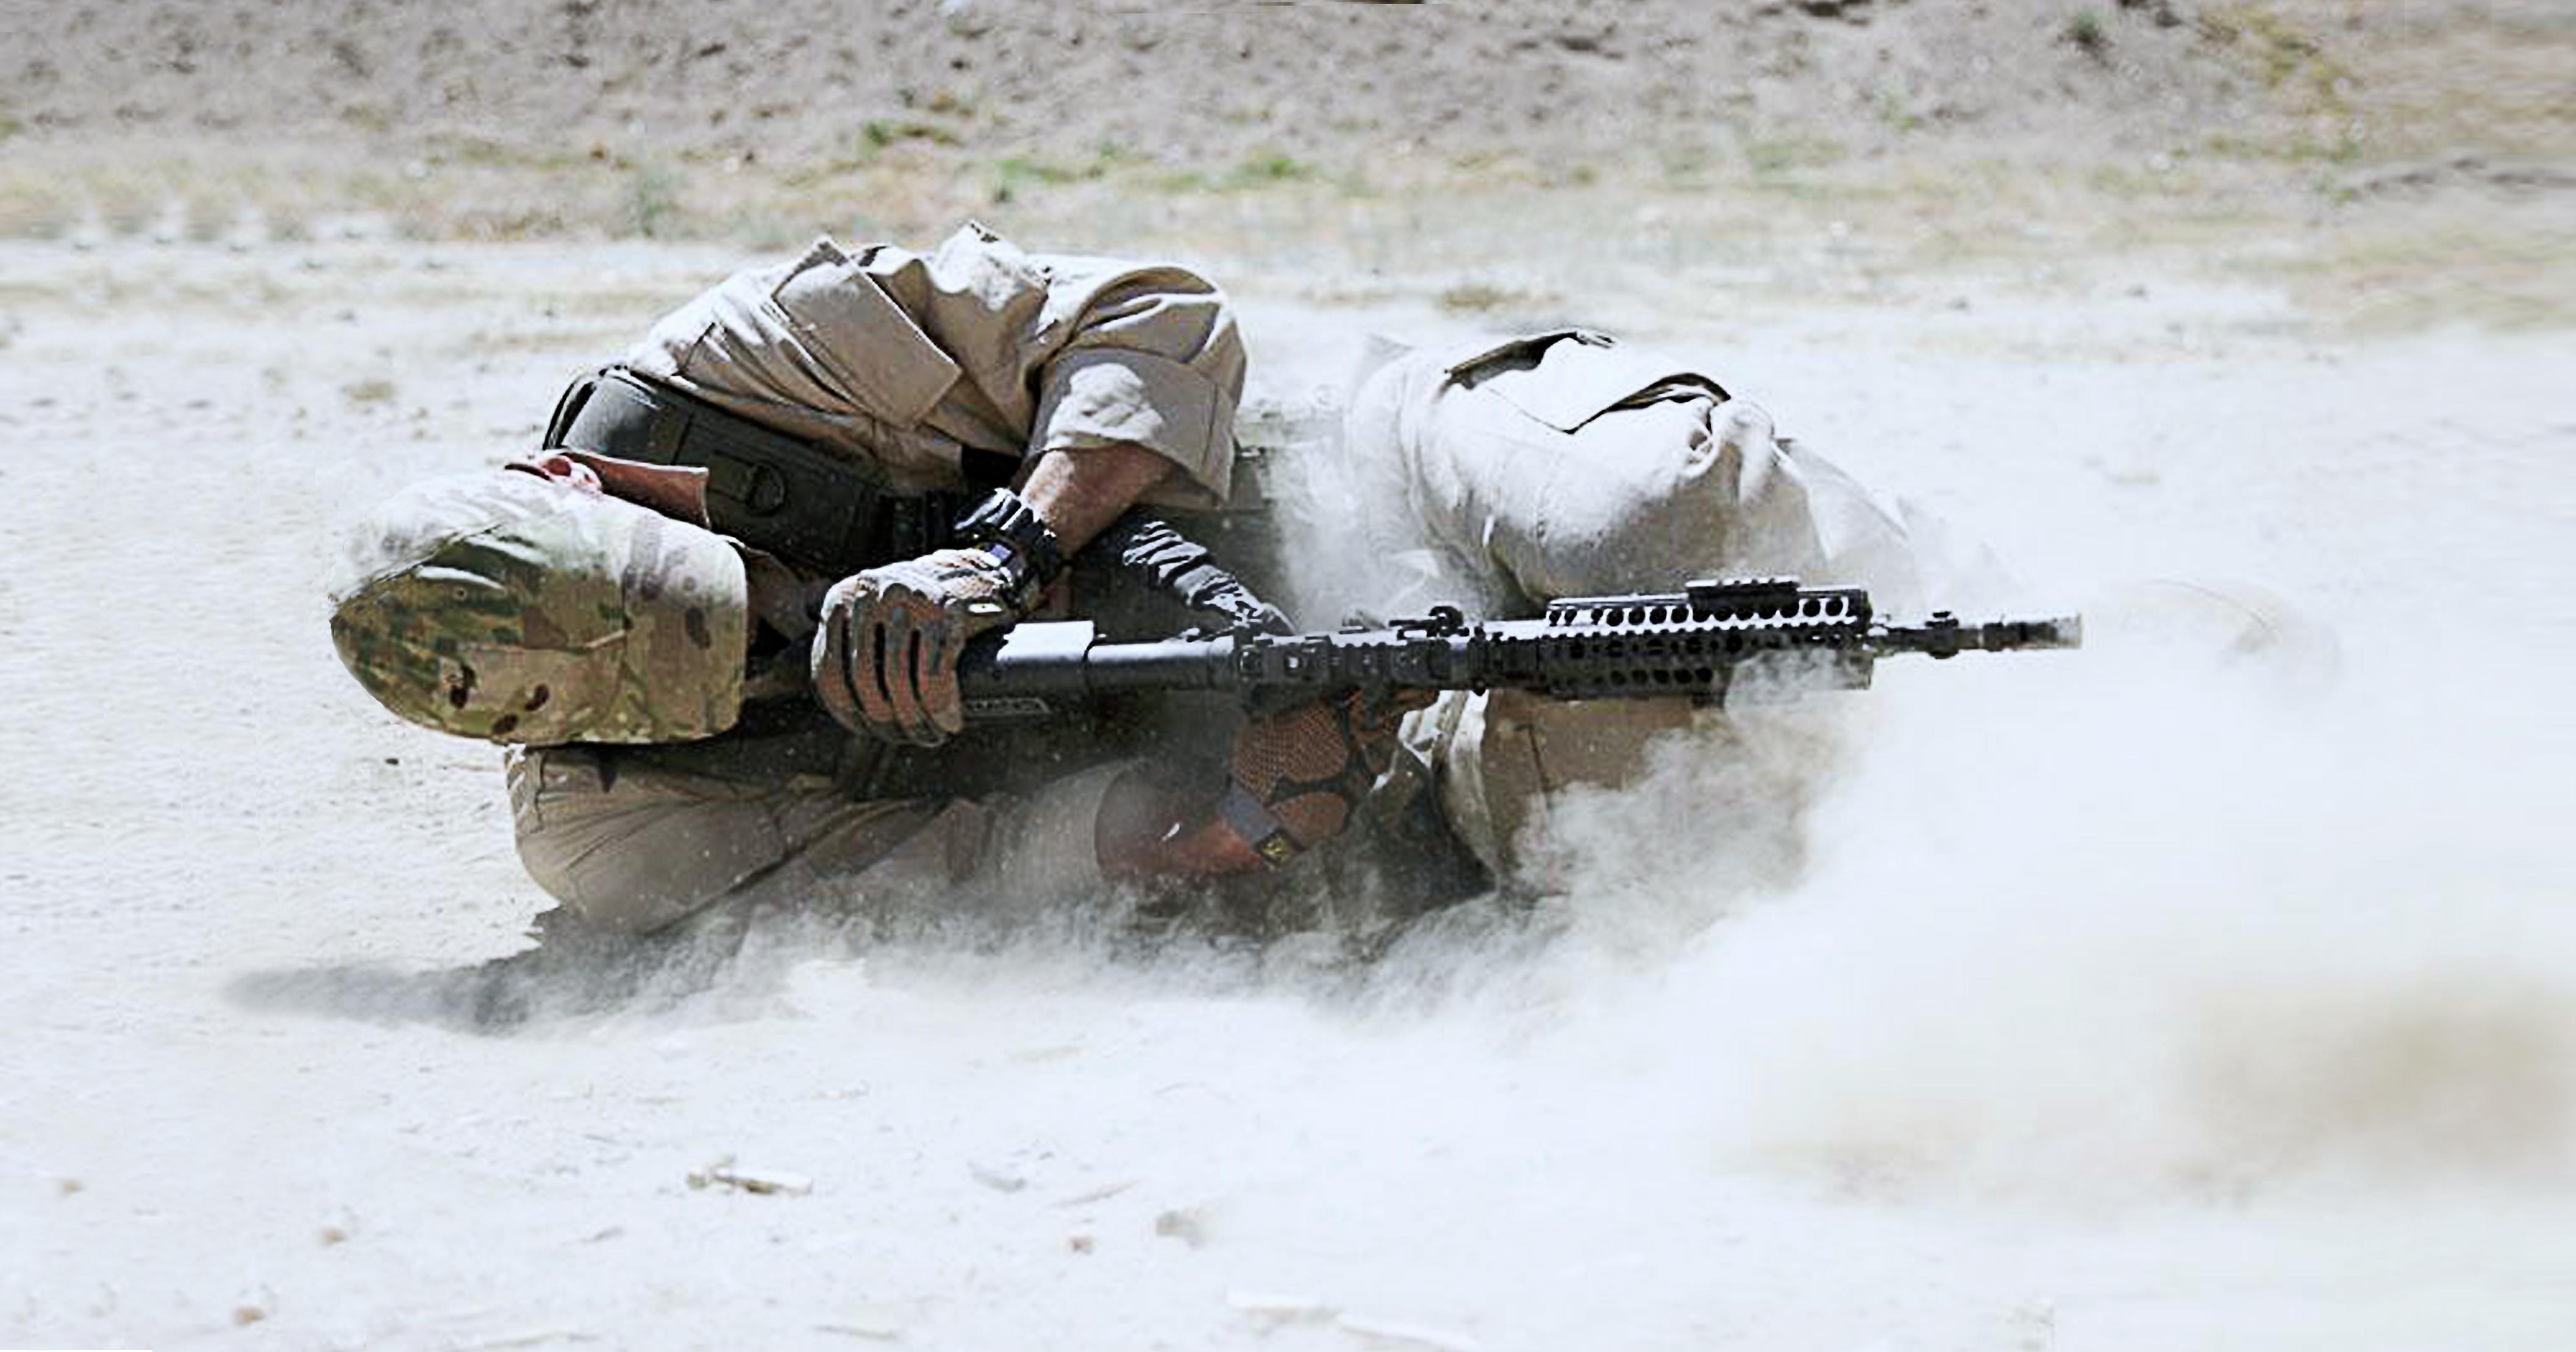 Navy SEAL Ethos